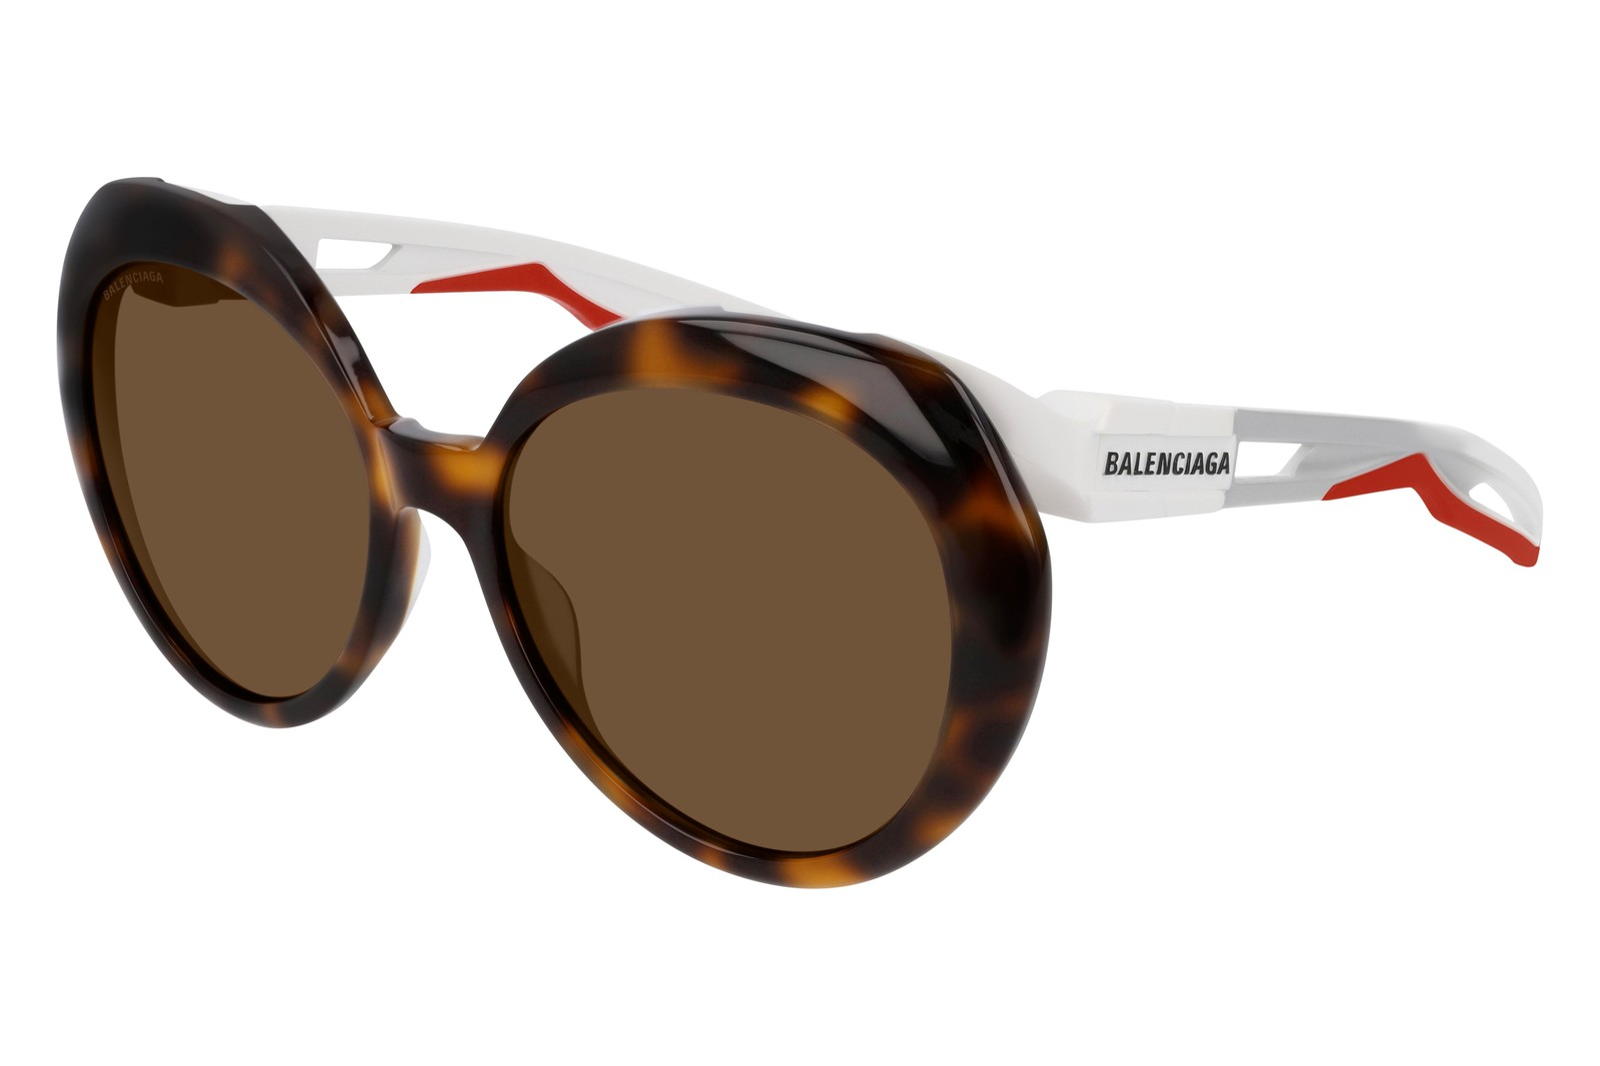 BALENCIAGA 帶來 2019 年夏季 HYBRID 眼鏡系列